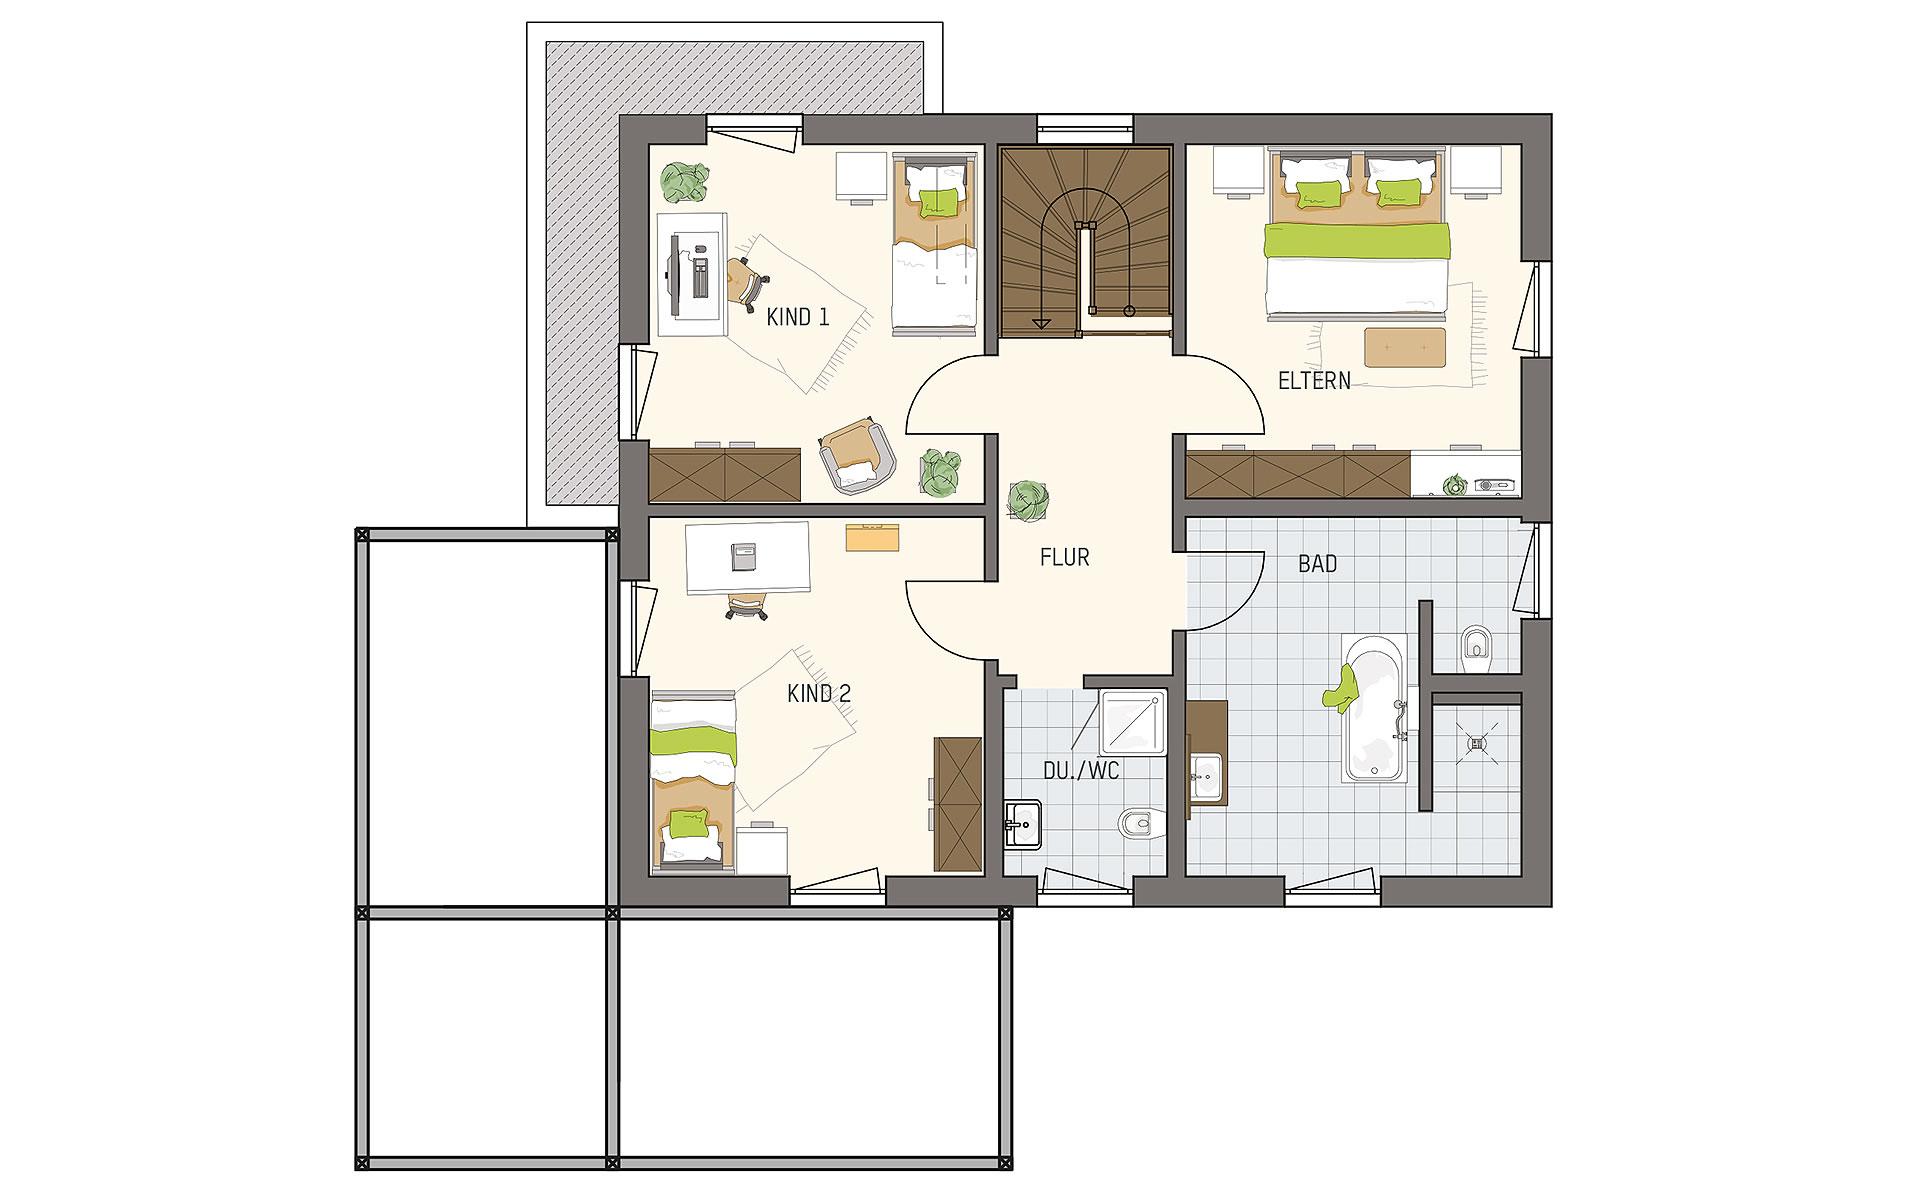 Obergeschoss MEDLEY 3.0 - MH Frankenberg von FingerHaus GmbH